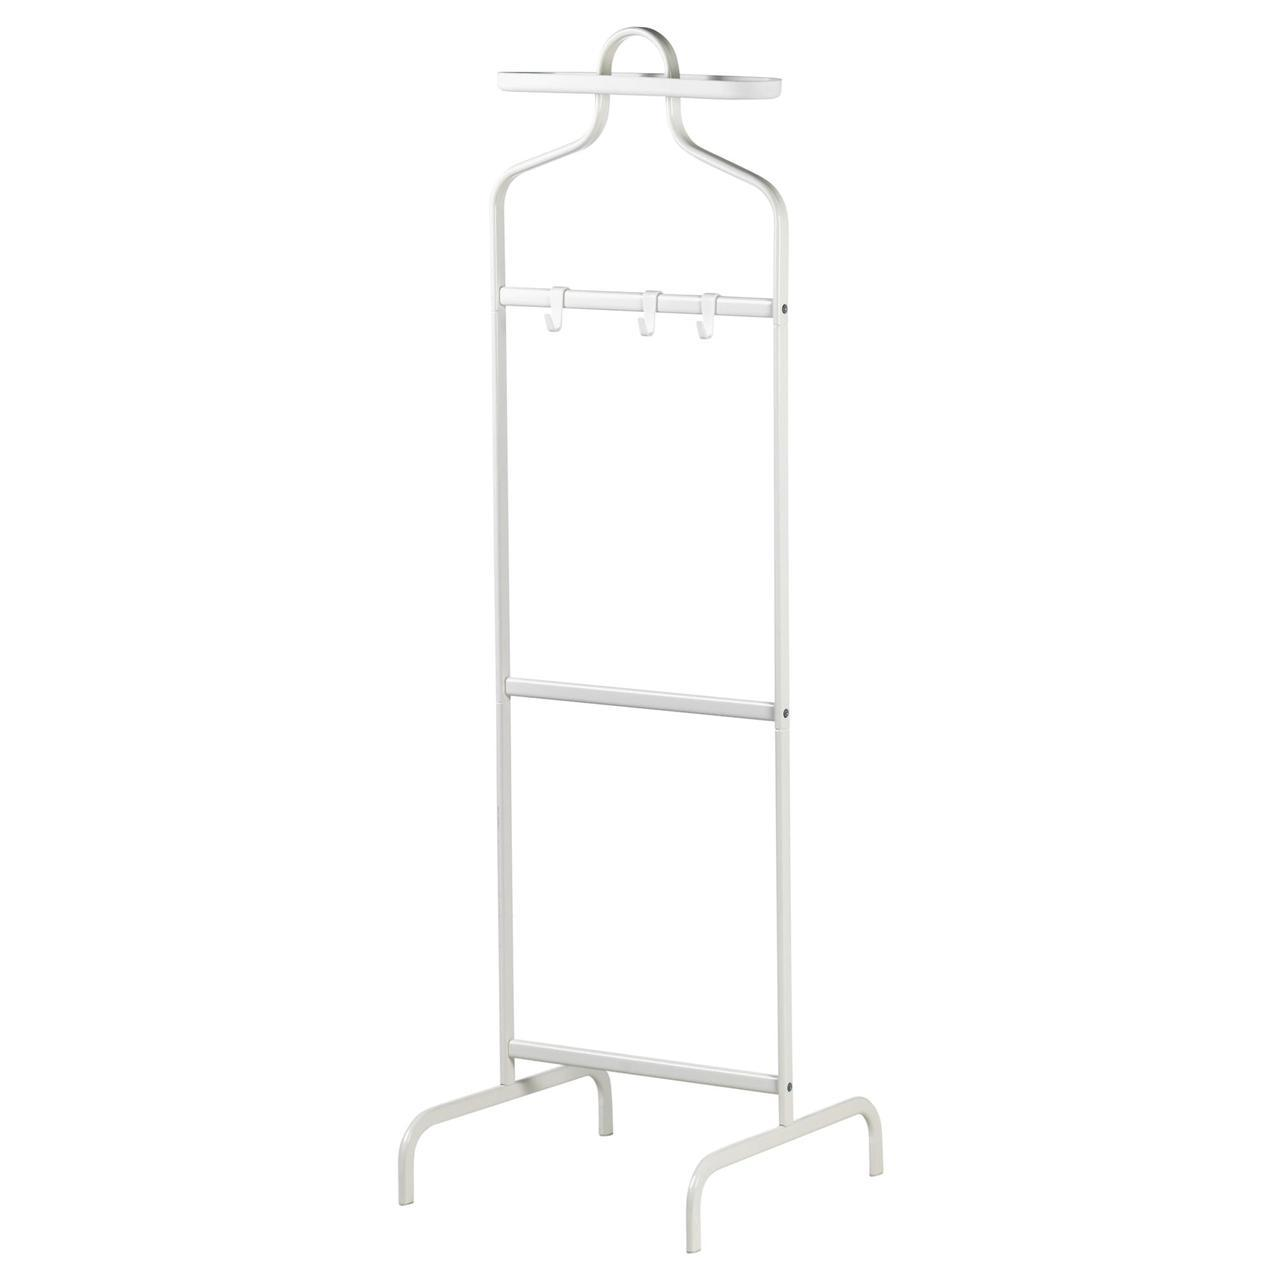 IKEA MULIG (502.191.43) Вешалка напольная, белый